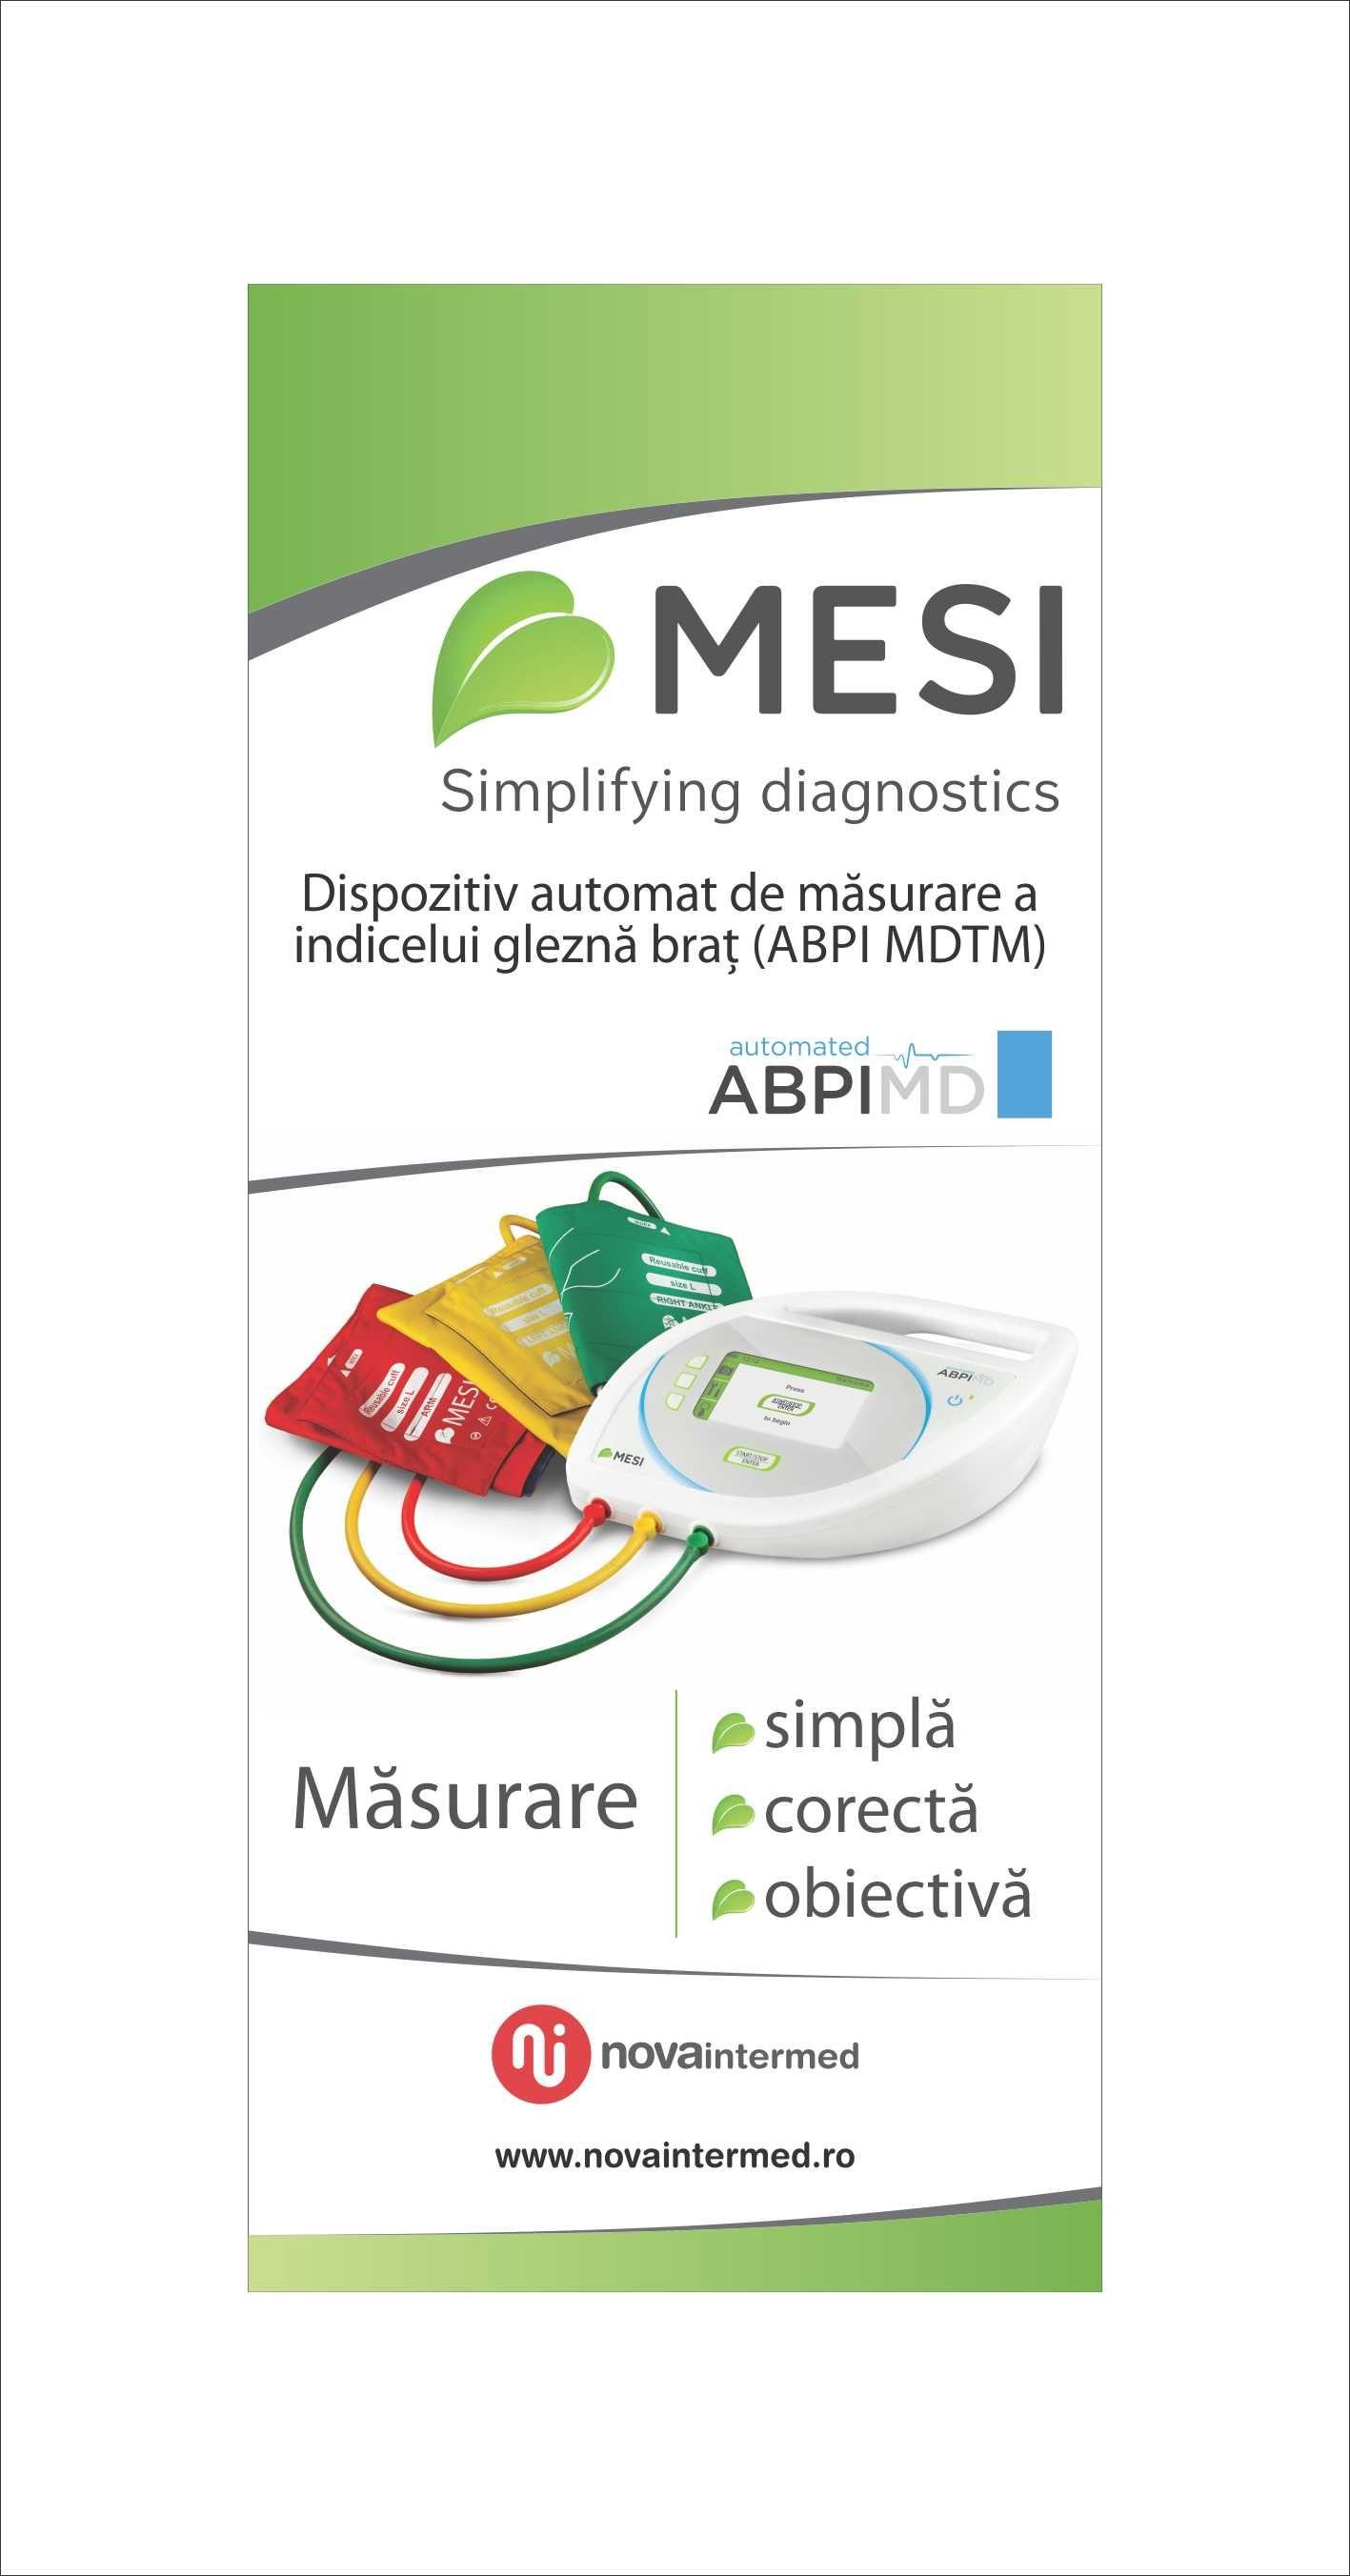 Dispozitiv automat de masurare a indicelui glezna-brat (ABPI MESI)